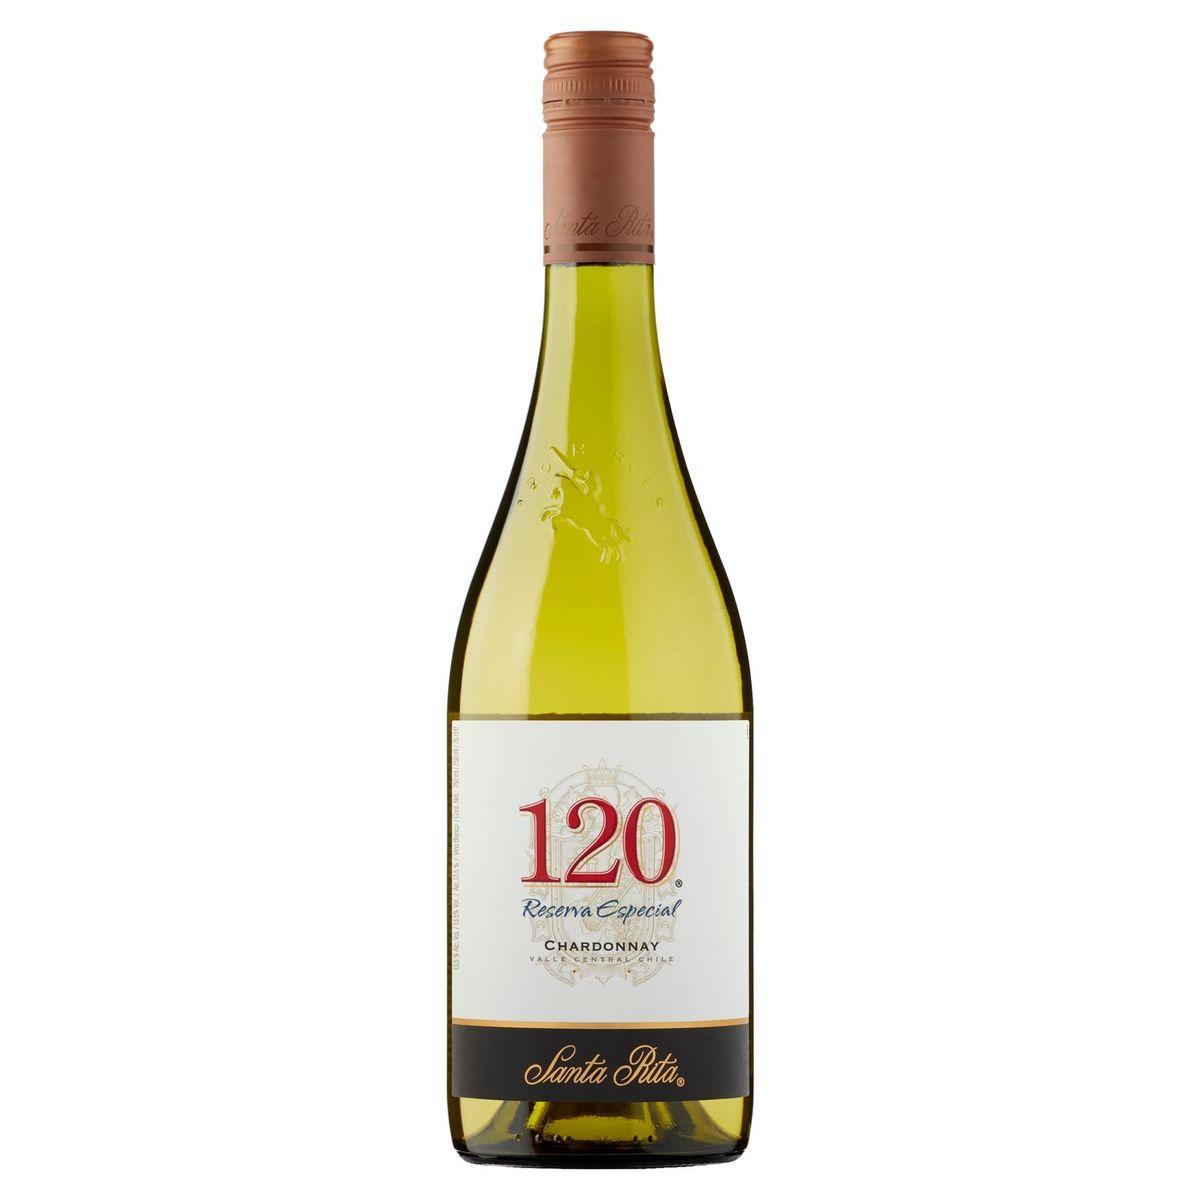 Chili Santa Rita 120 Reserva Especial Chardonnay